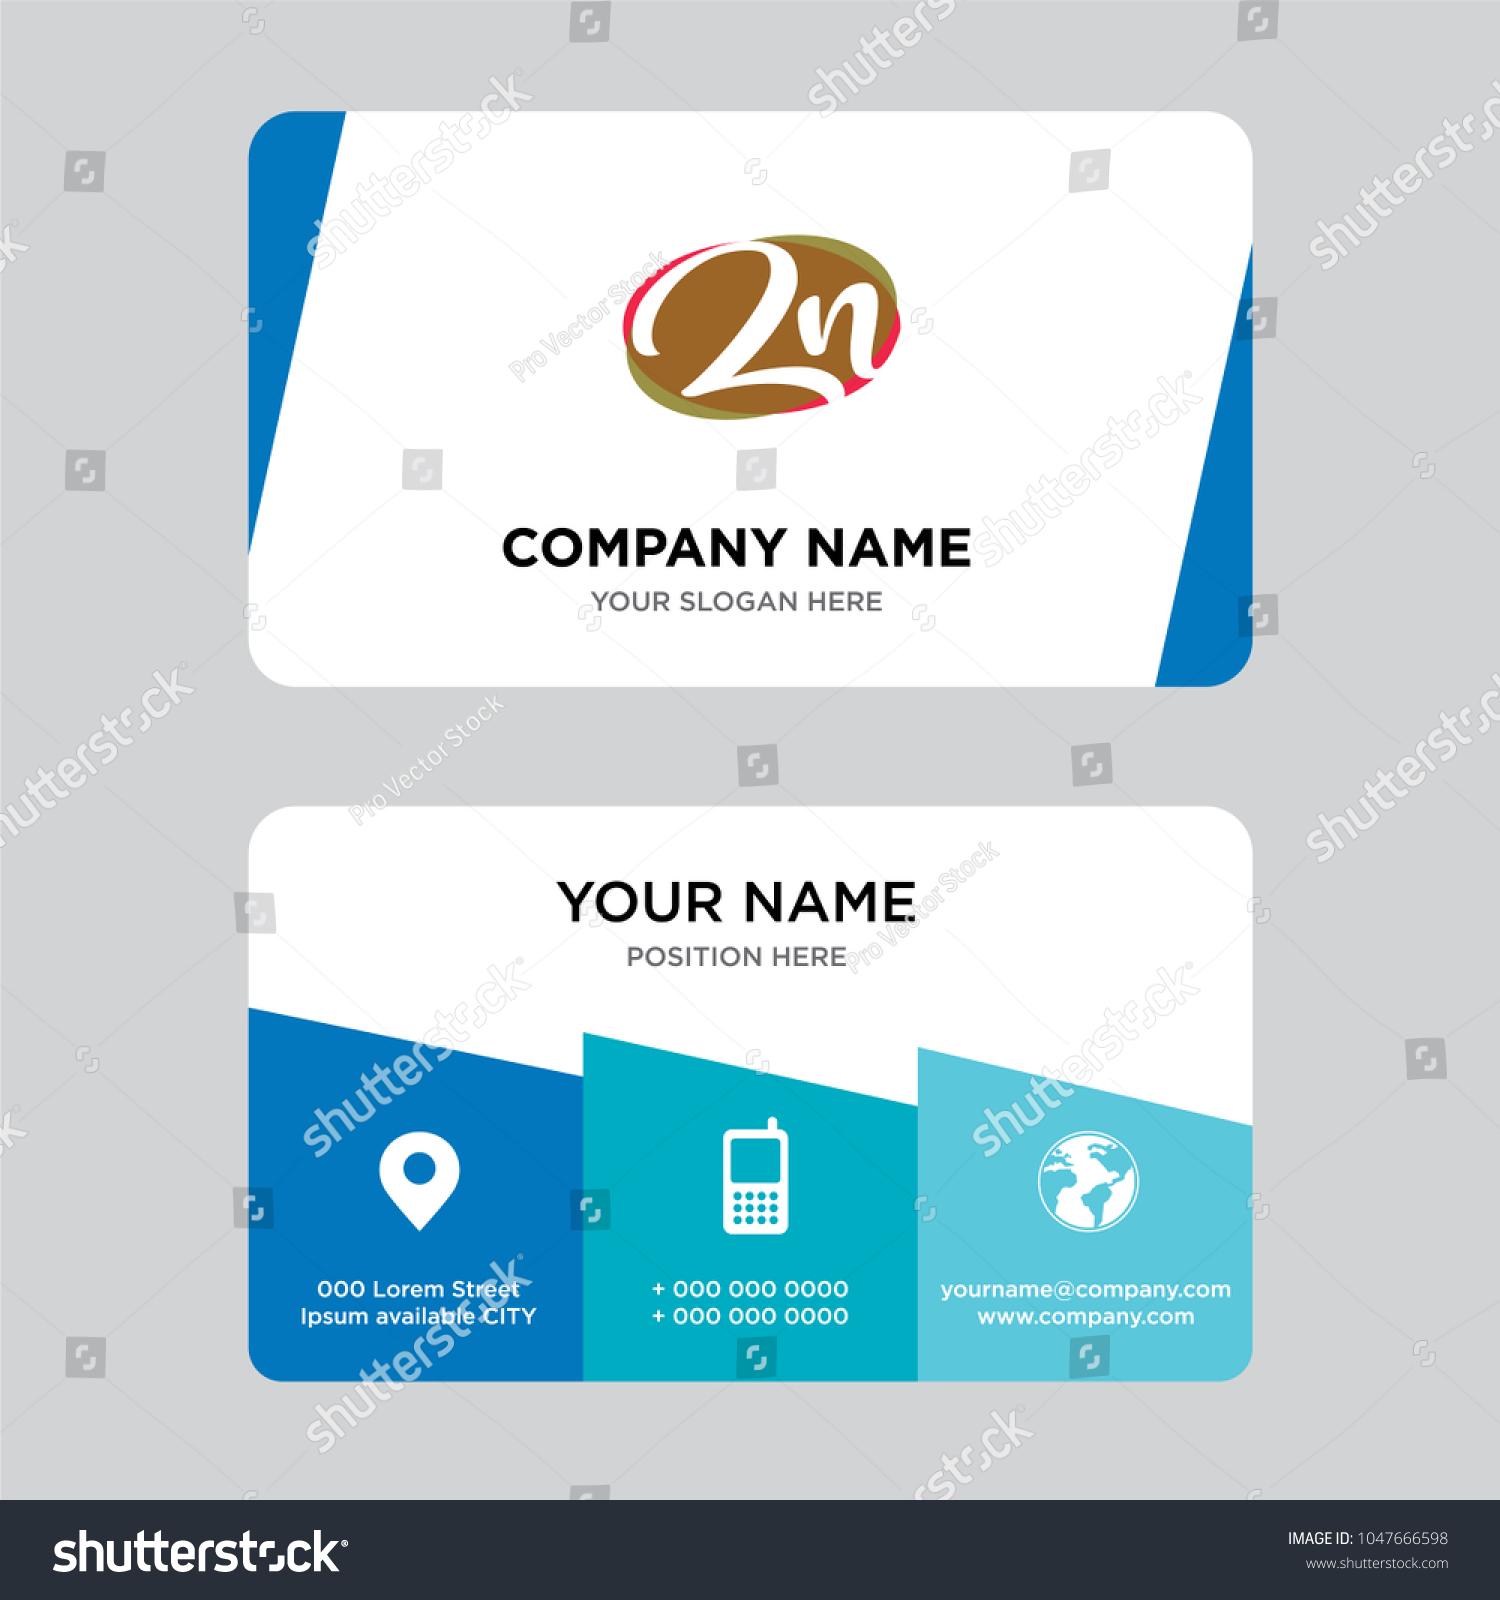 Zn Nz Business Card Design Template Stock Vector 1047666598 ...